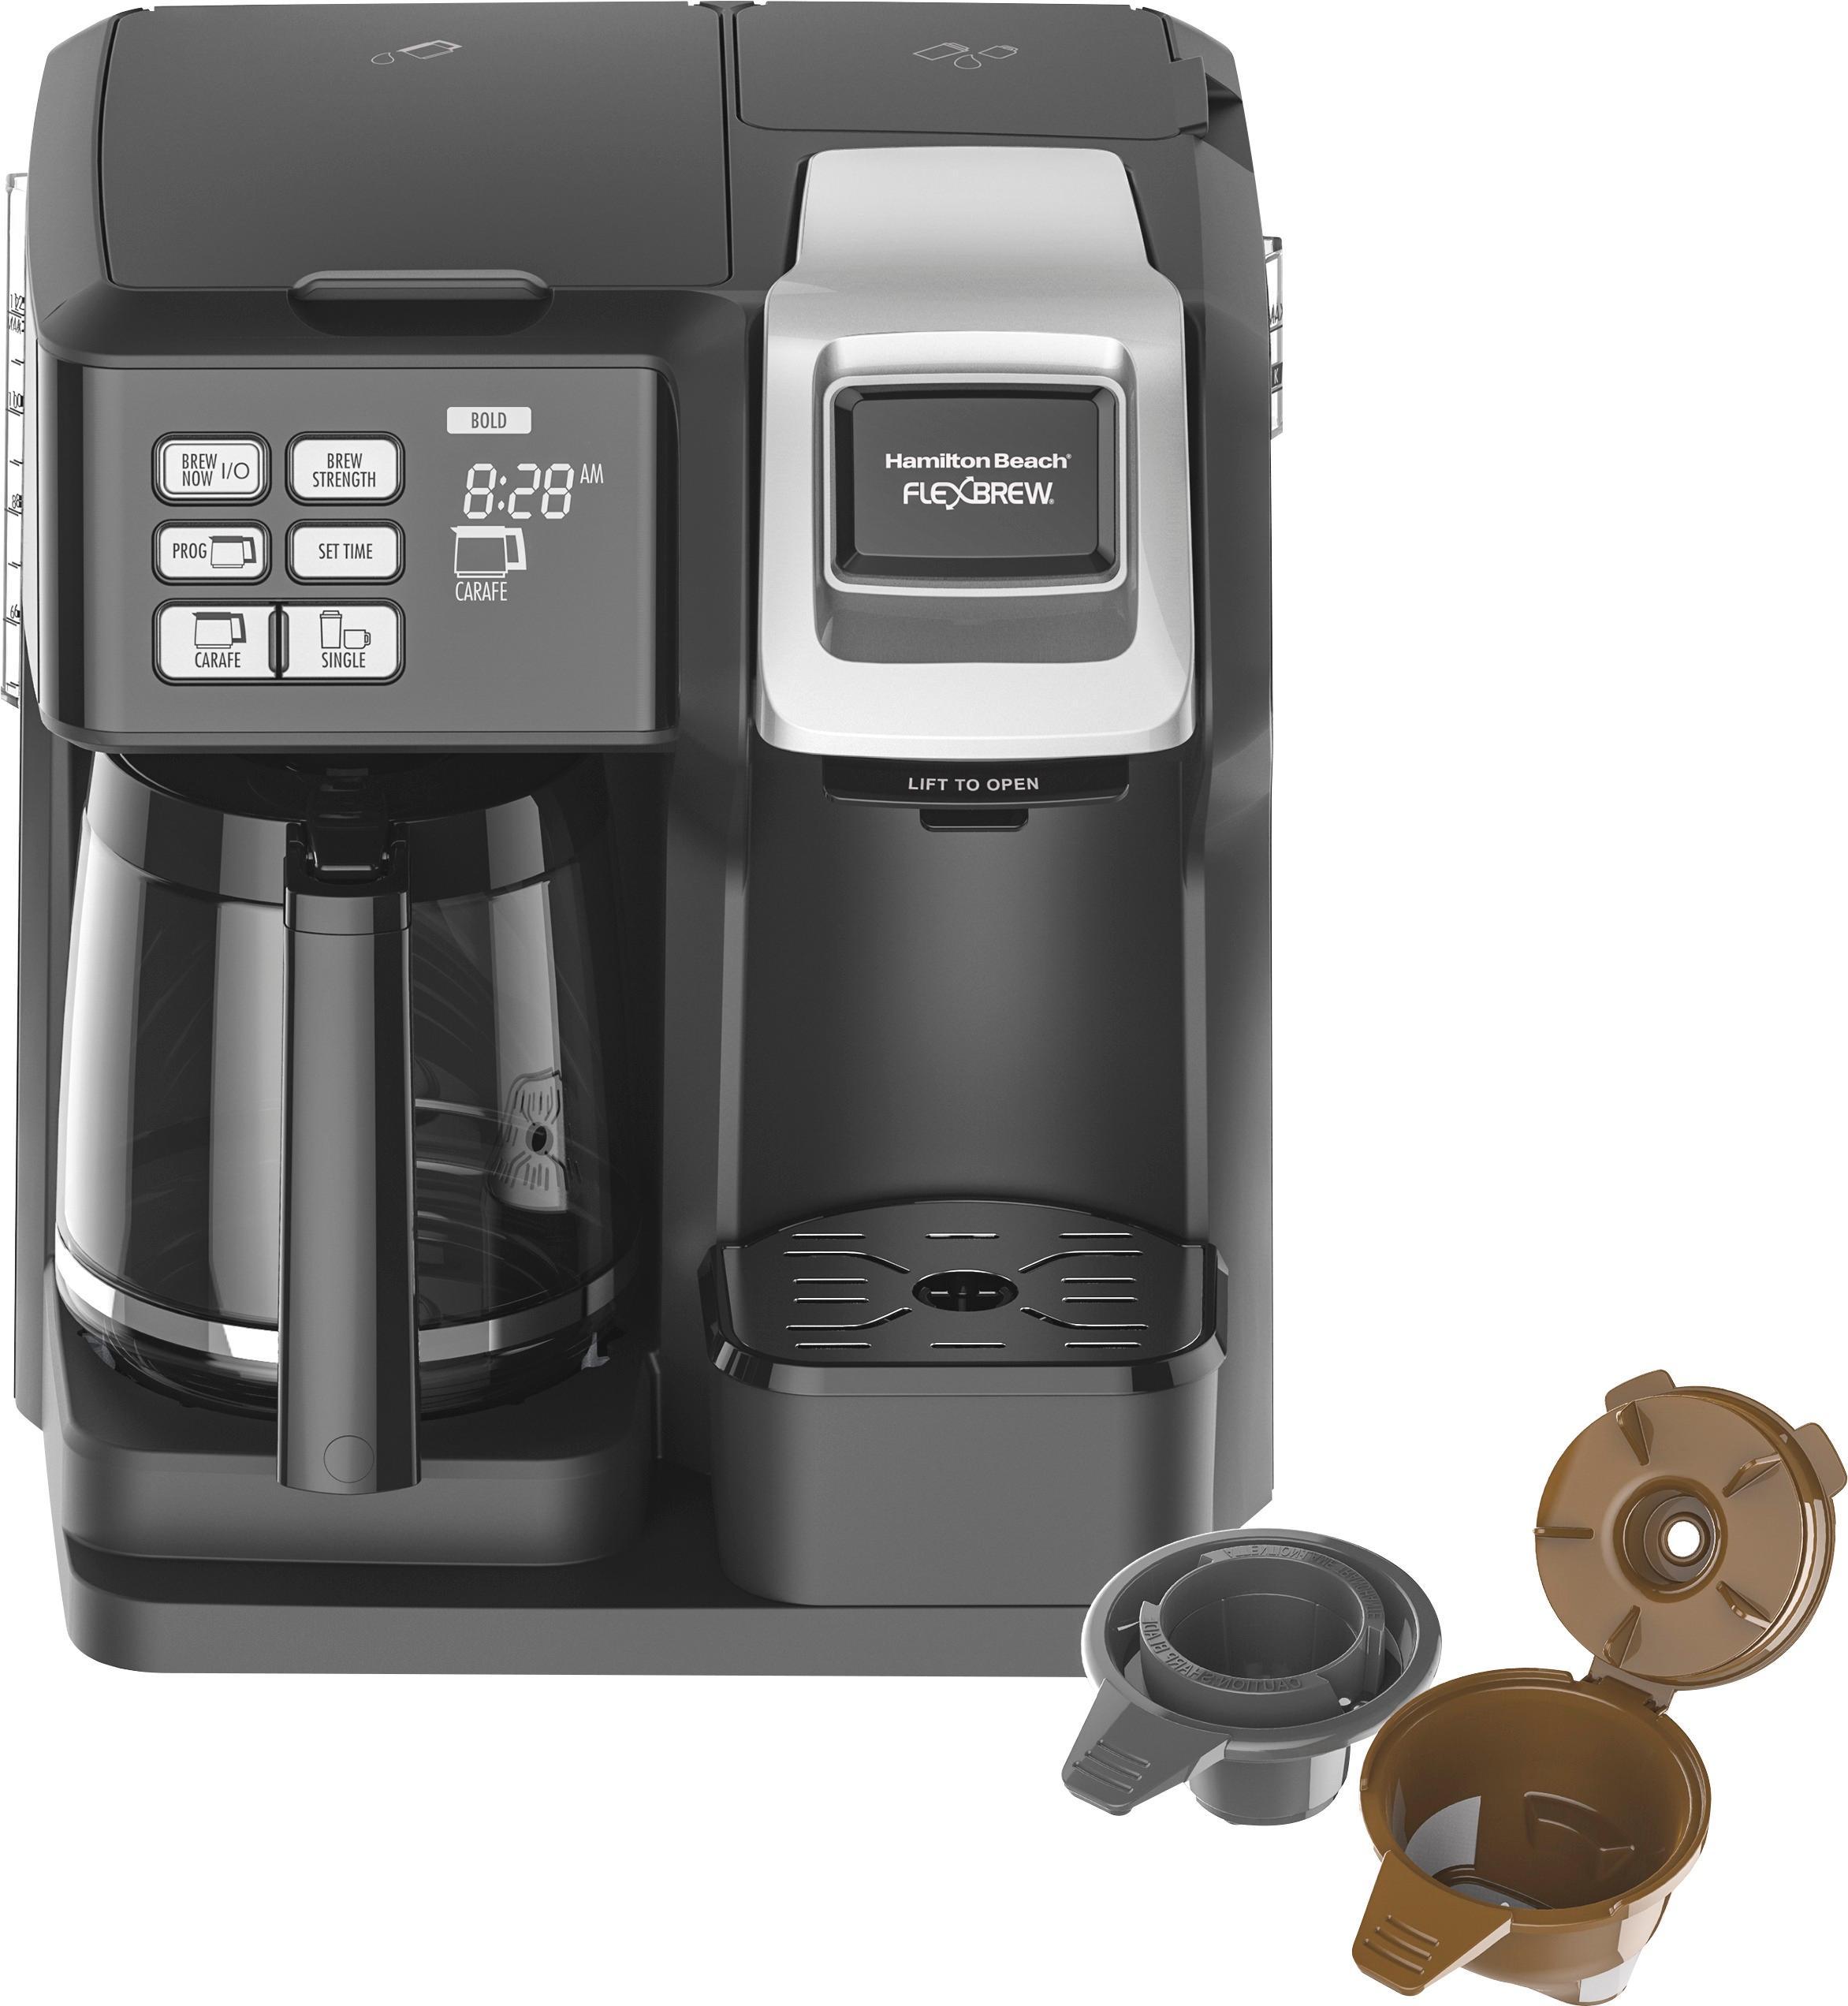 Hamilton Beach - FlexBrew 12-Cup Coffeemaker - Black 5890804